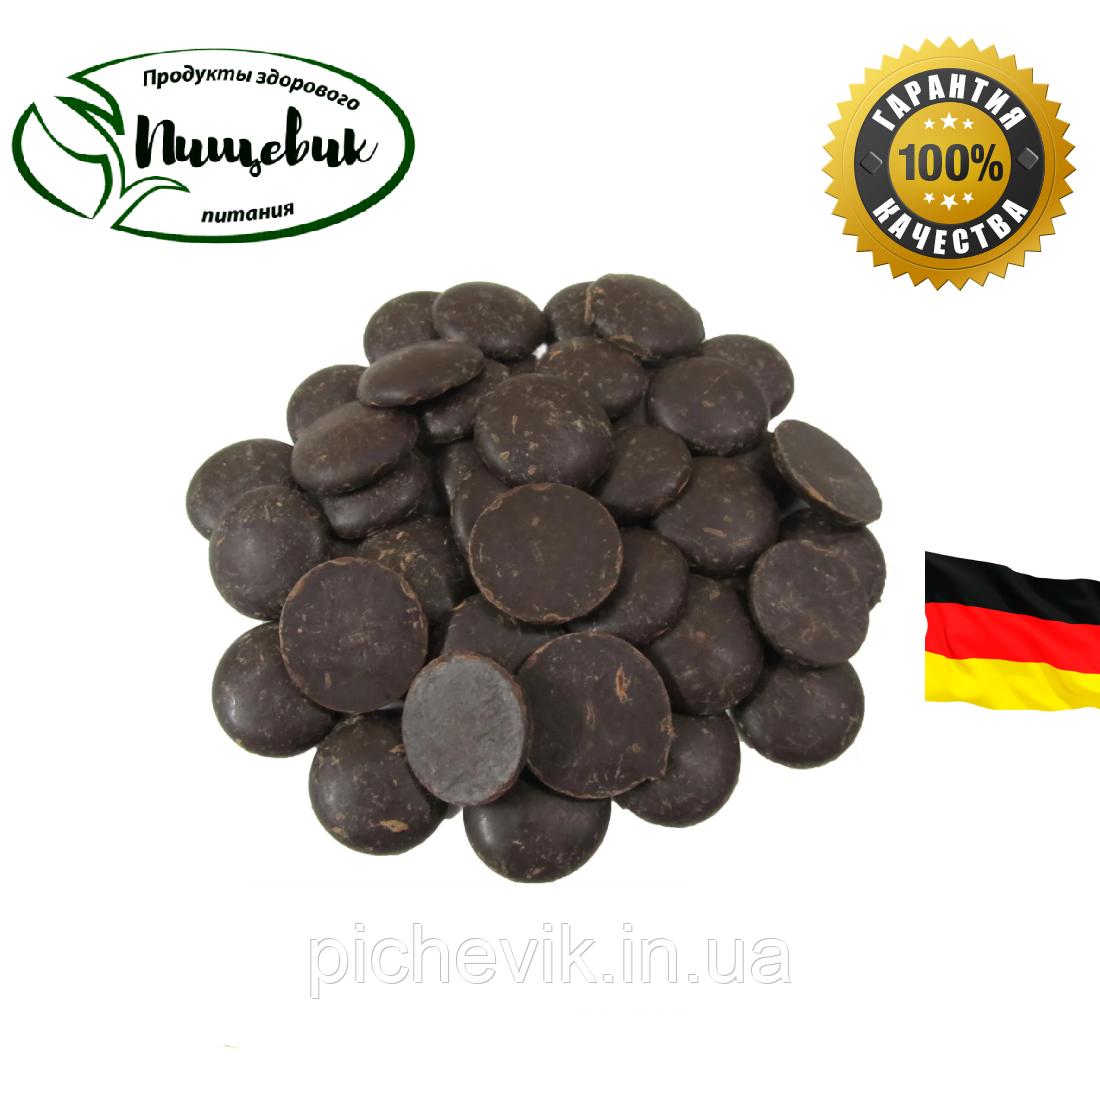 Какао тертое (Германия) ТМ Schokinag, в каллетах. Вес:250 грамм